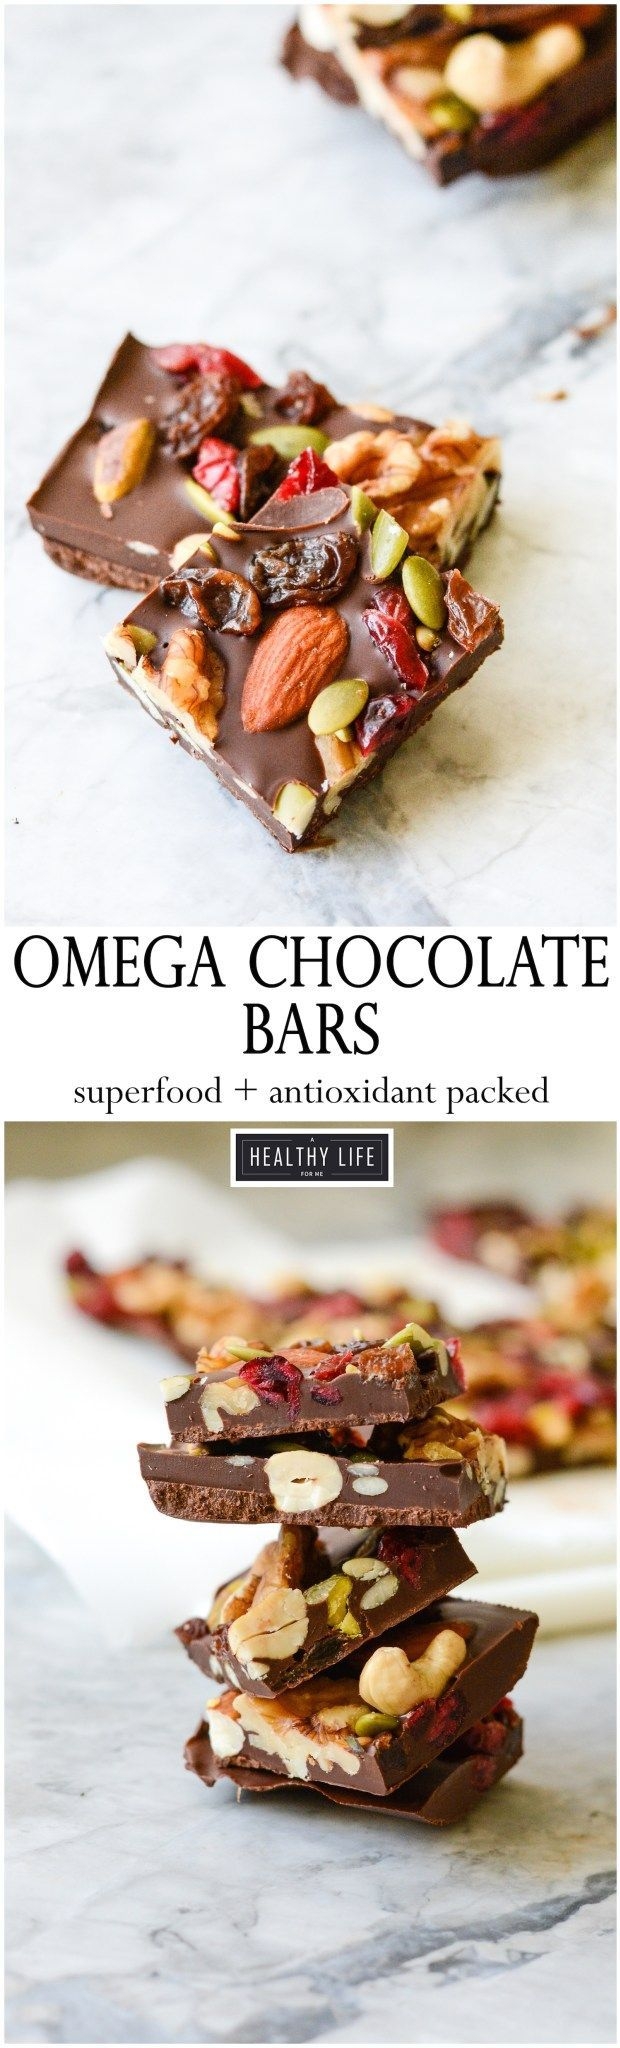 Omega Chocolate Bars